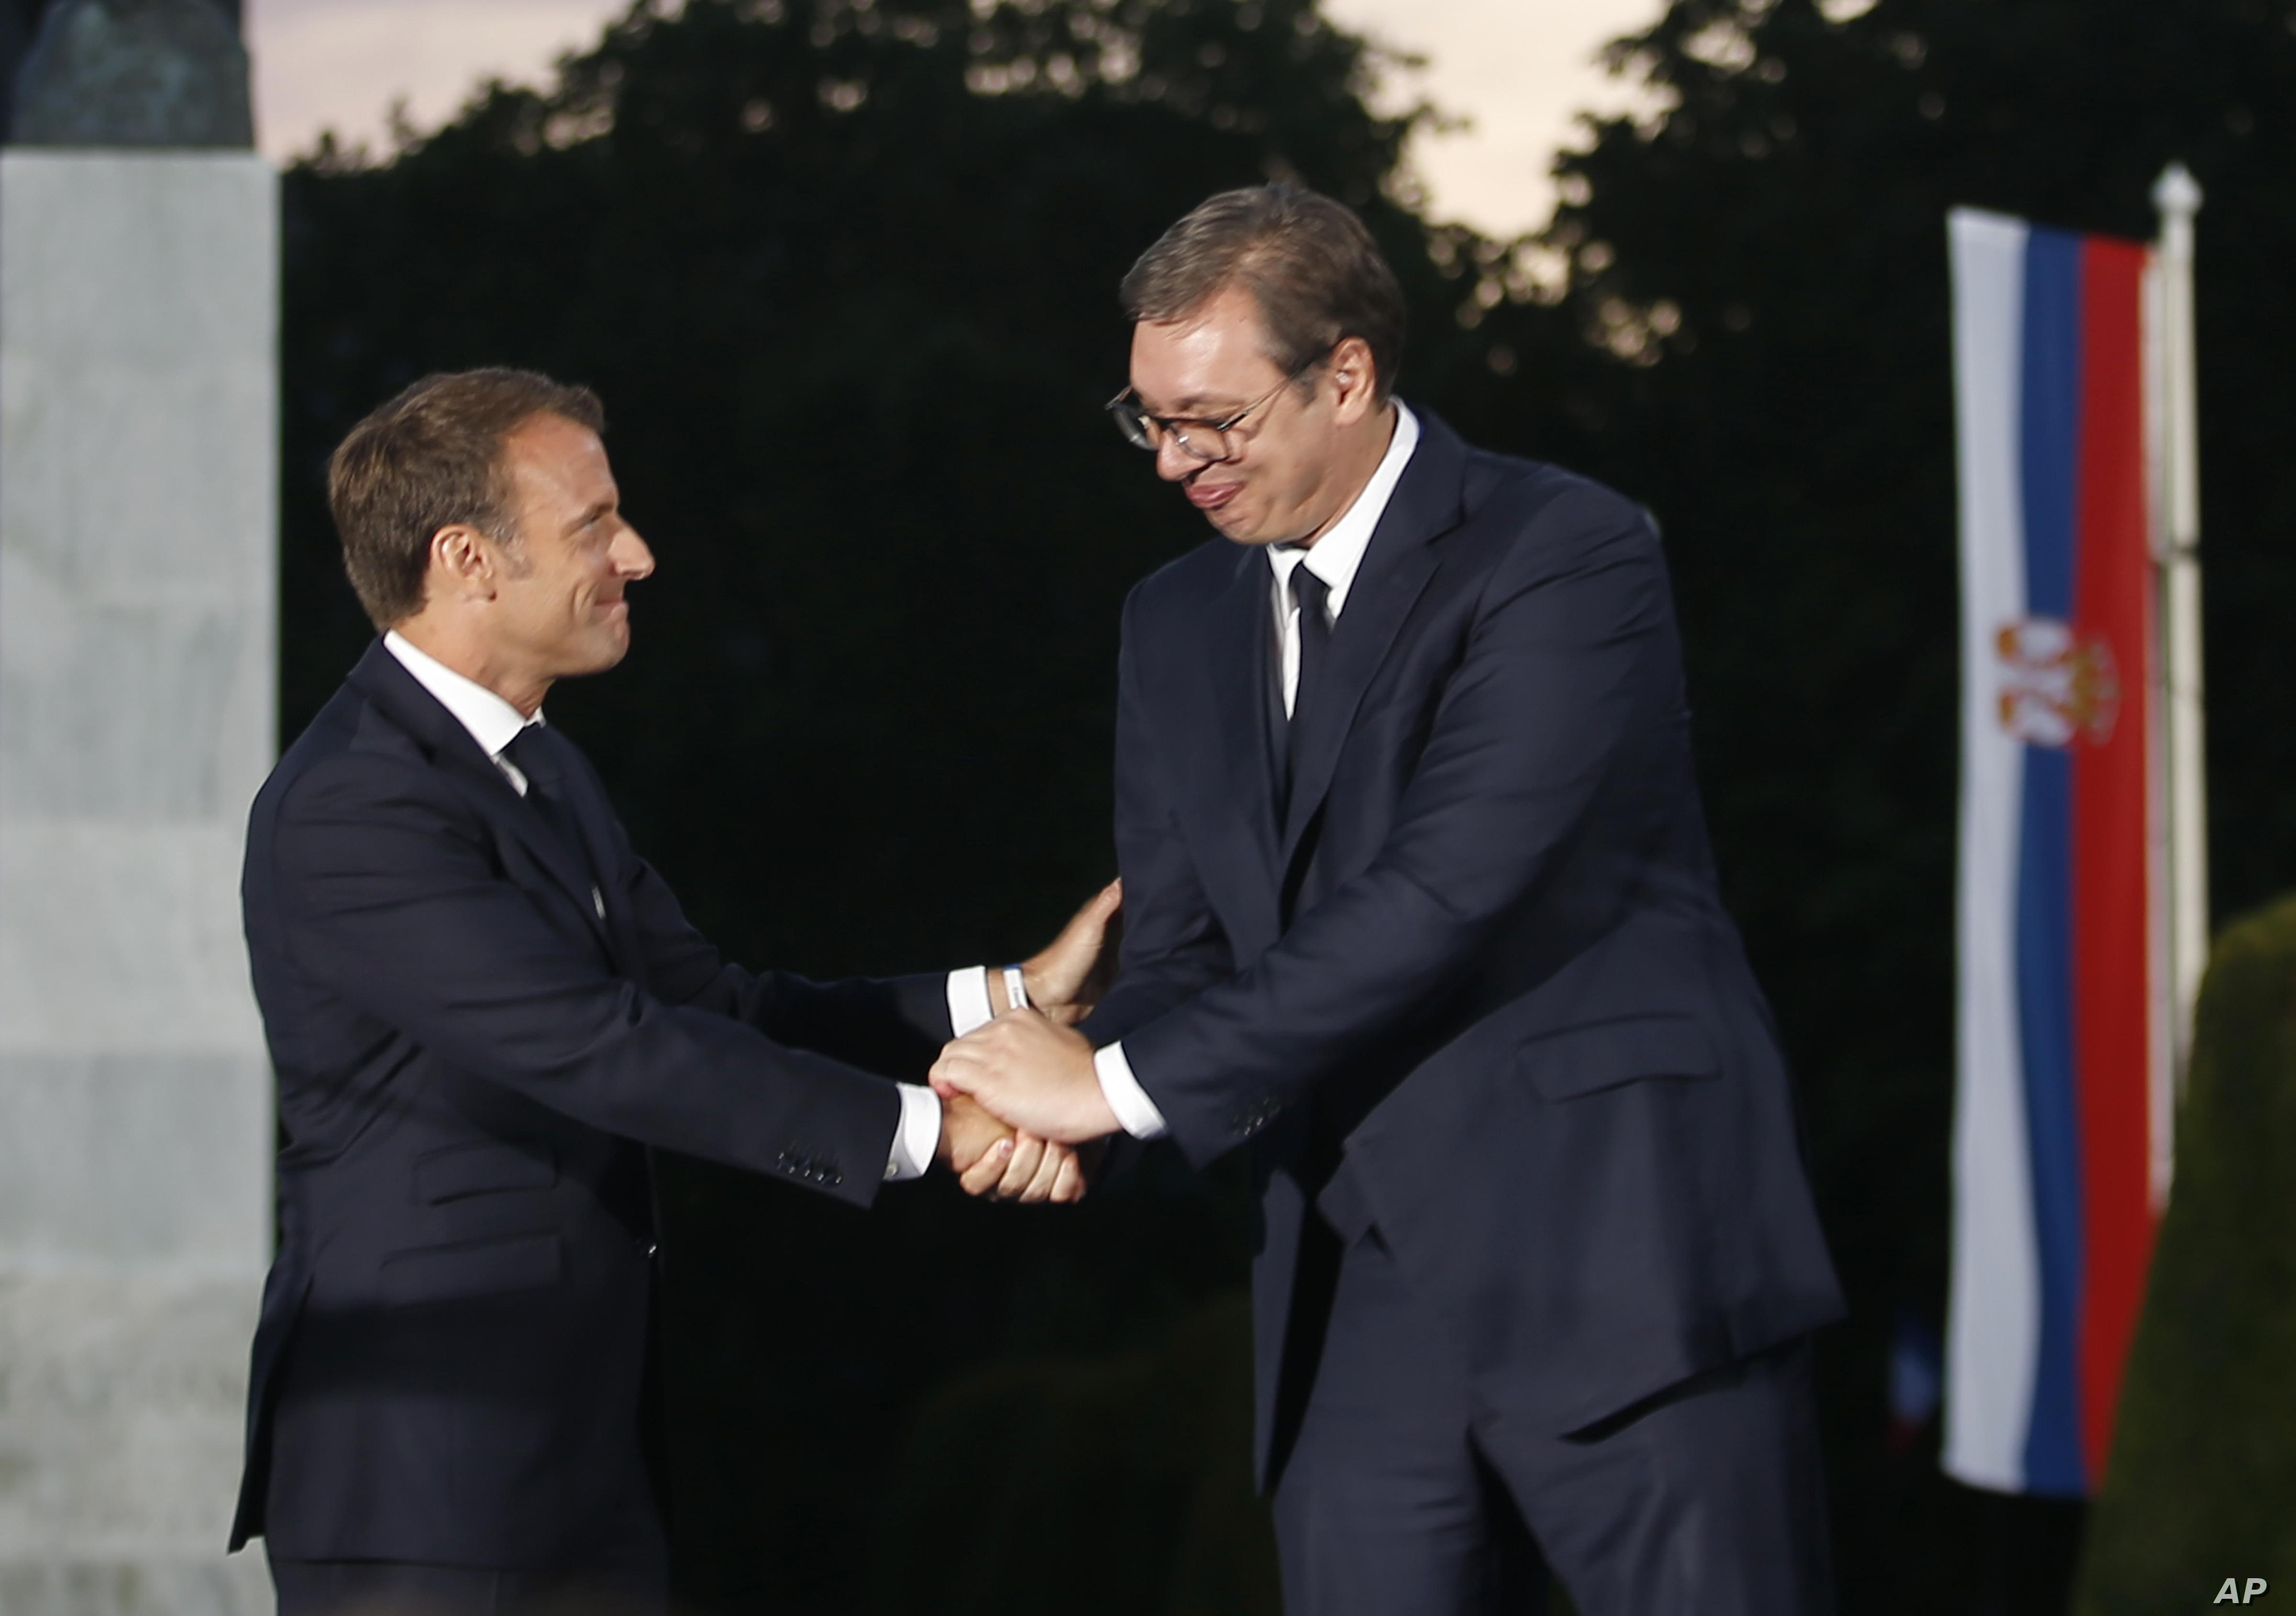 French President Emmanuel Macron, left, and Serbian President Aleksandar Vucic shake hands during an event at Veliki Kalemegdan Park in Belgrade, Serbia, Monday, July 15, 2019. French President Emmanuel Macron is for a two days official visit in…